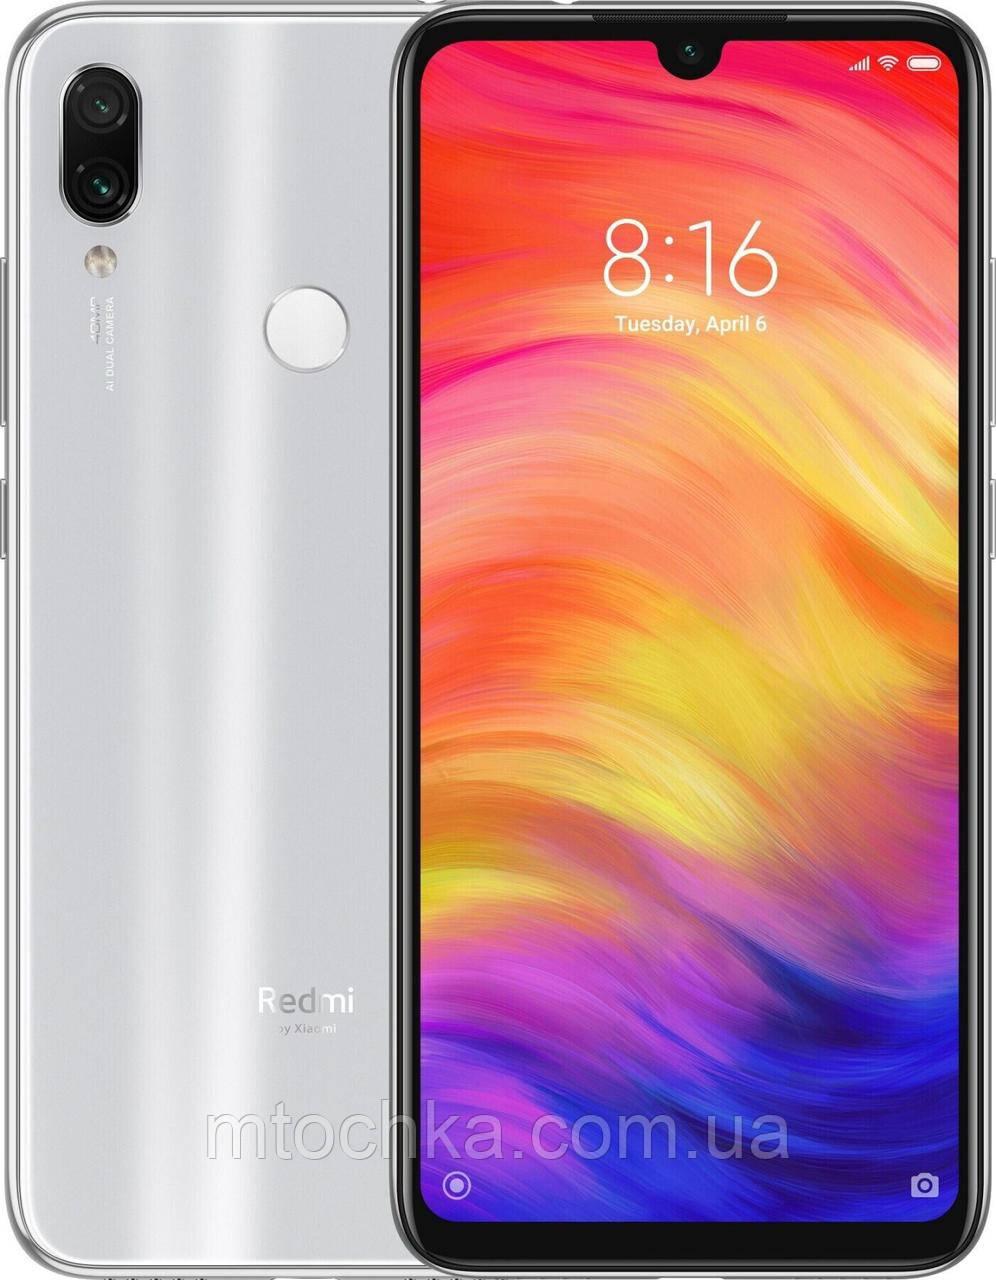 Телефон Xiaomi Redmi Note 7 4/128 GB Moonlight White